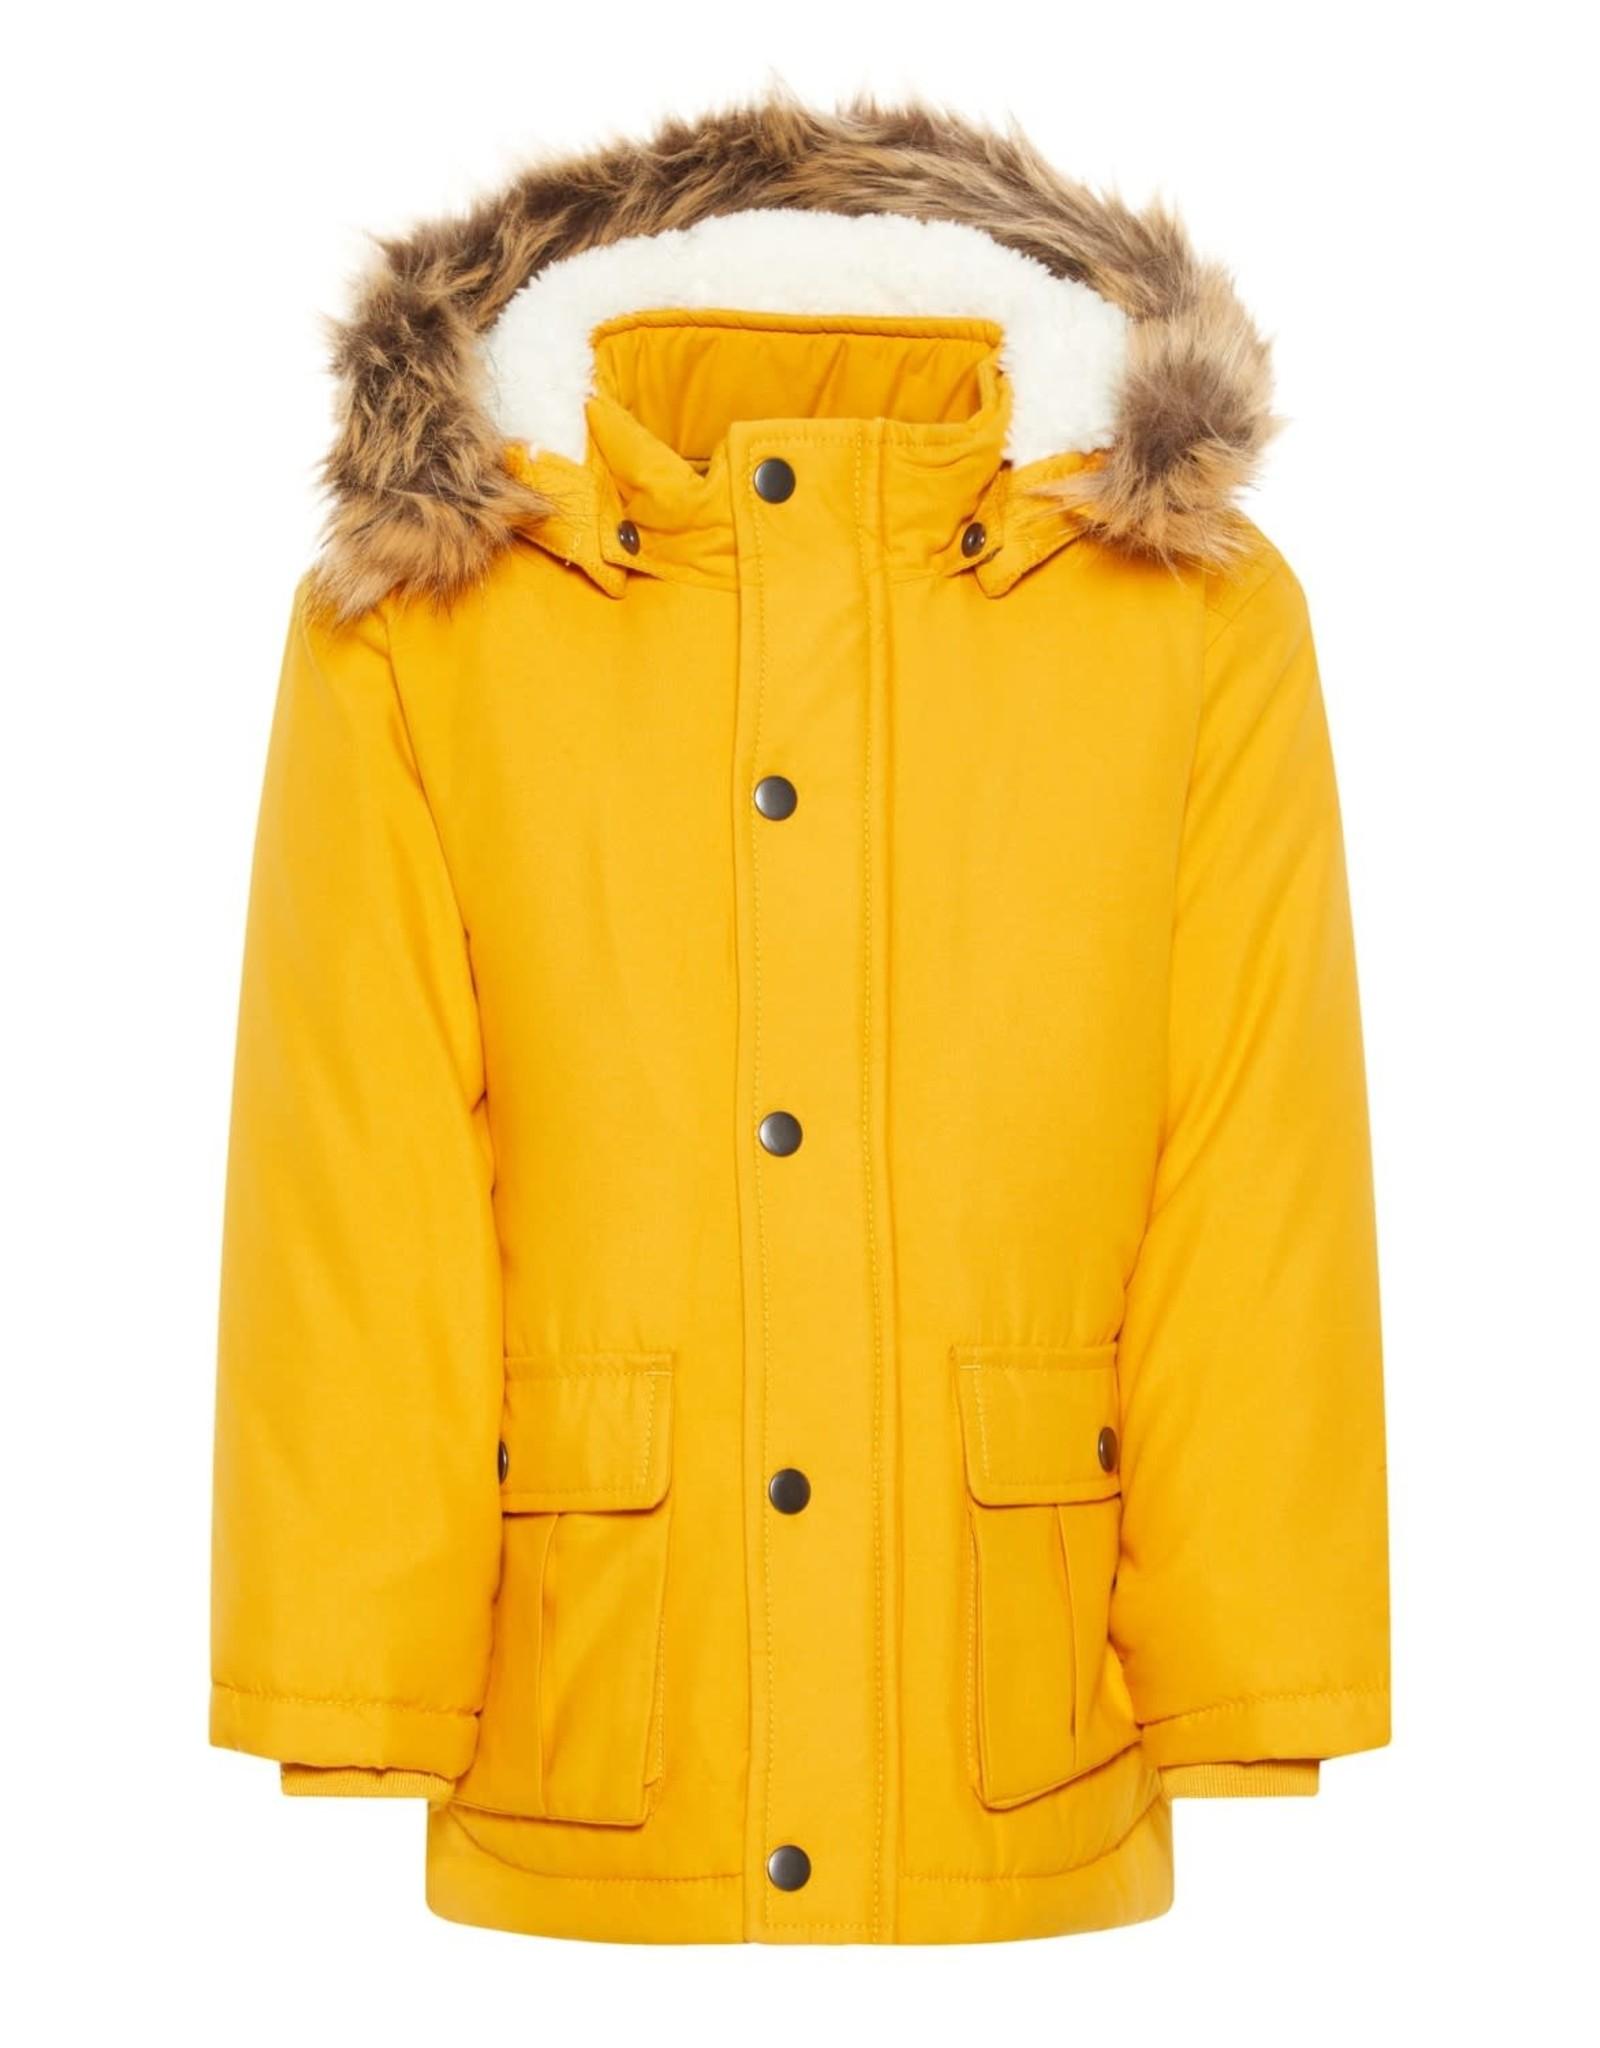 Name It Gele unisex winter parka jas - LAATSTE MAAT 110